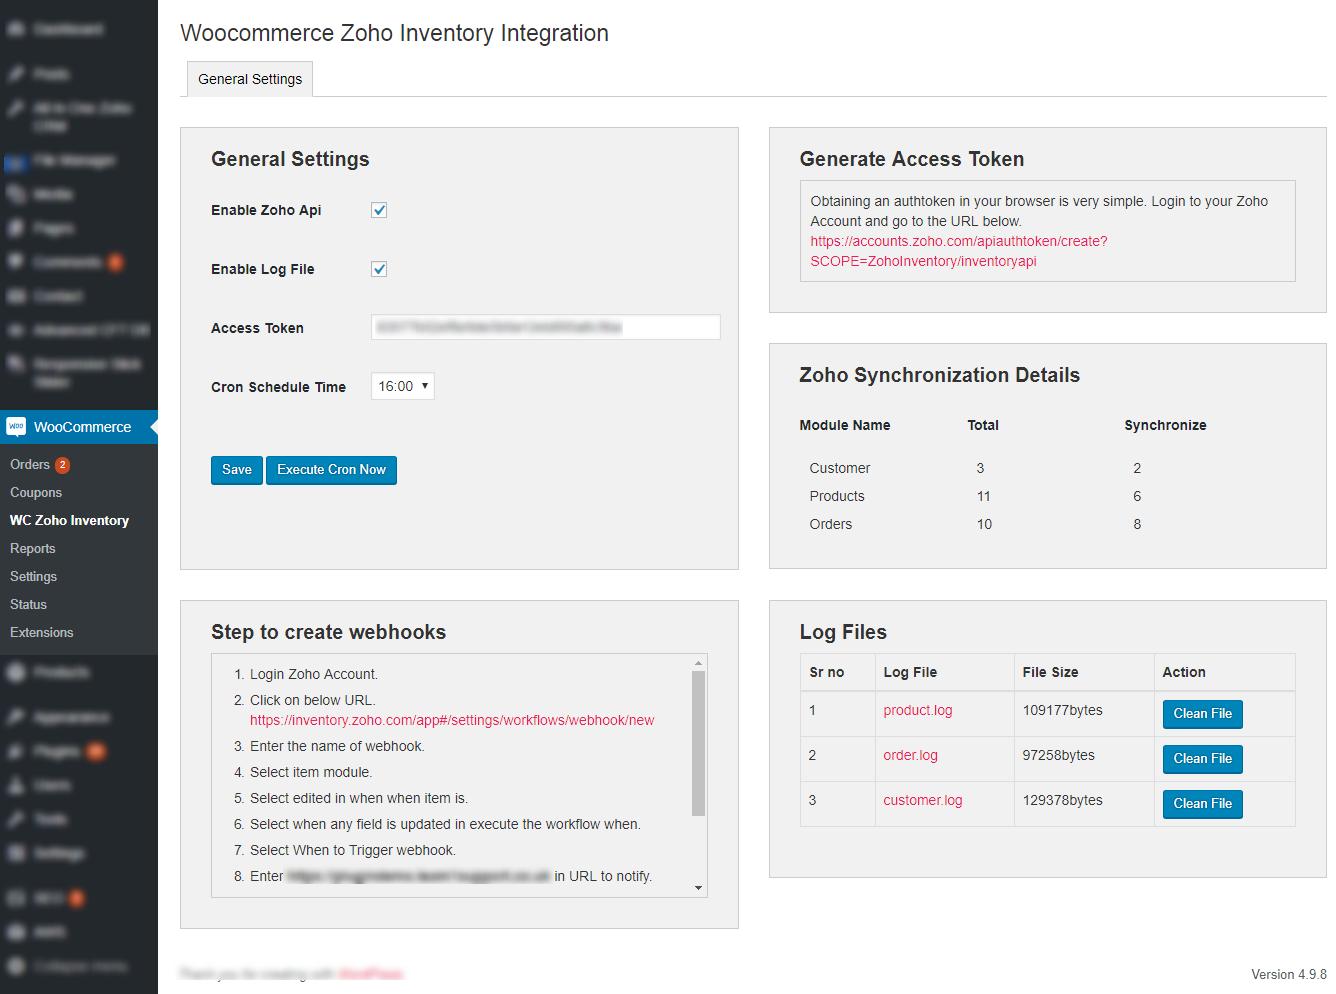 WooCommerce Zoho Inventory Integration